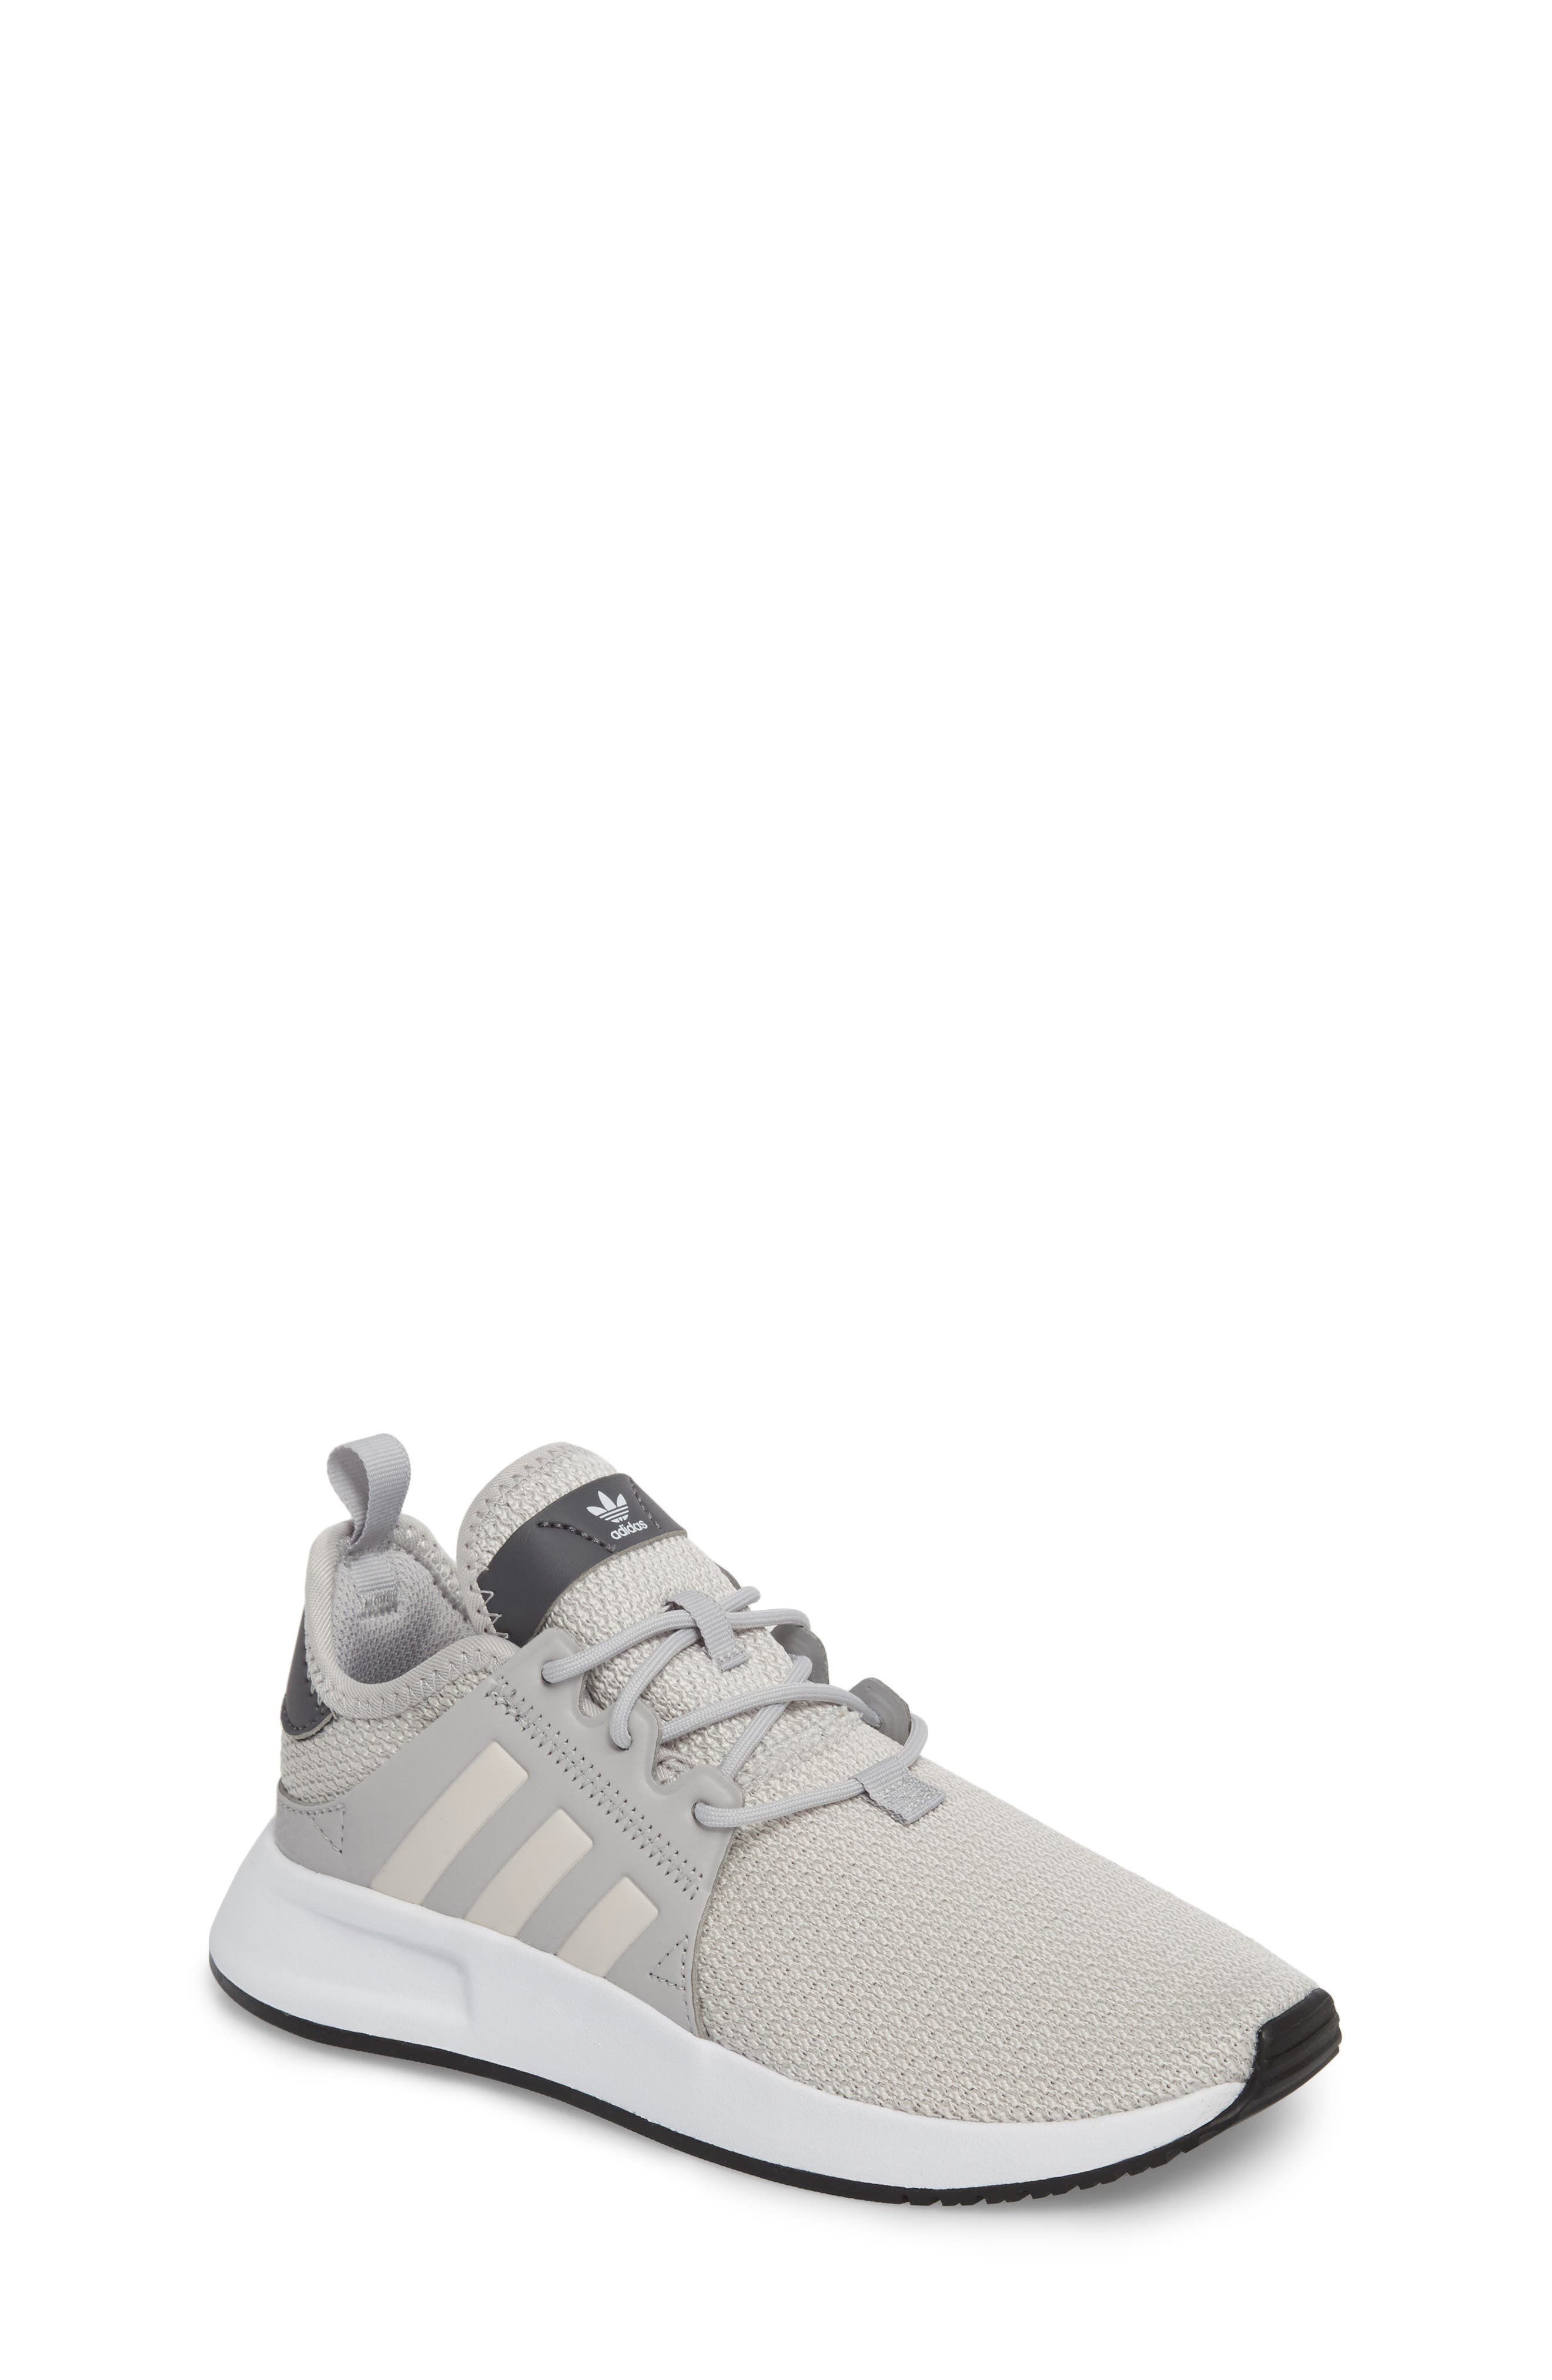 adidas X_PLR Sneaker (Baby, Walker, Toddler, Little Kid & Big Kid)